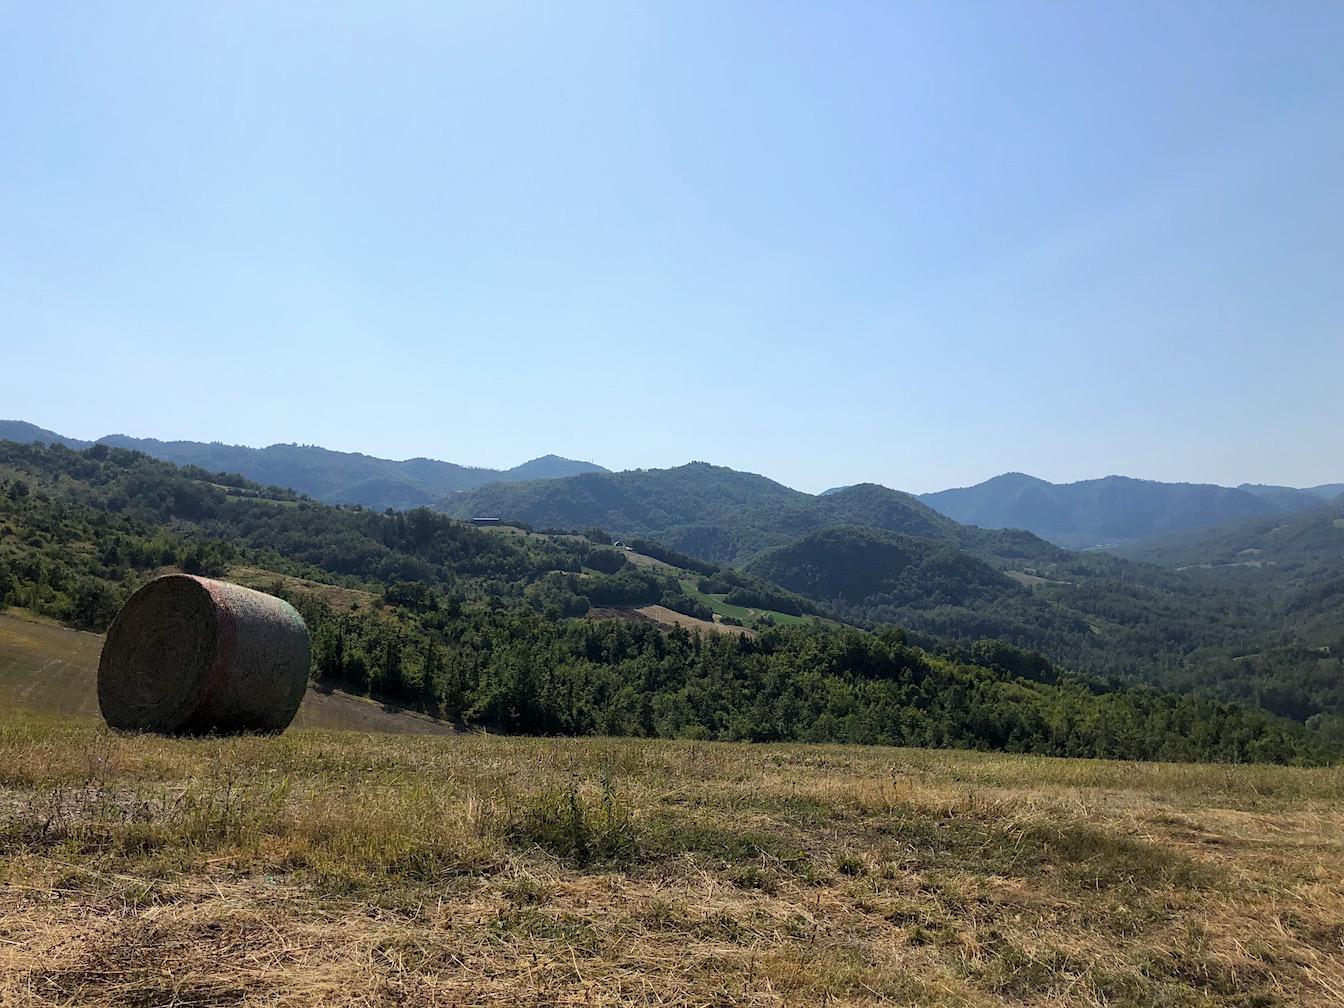 Blick in die Berge des Apennin